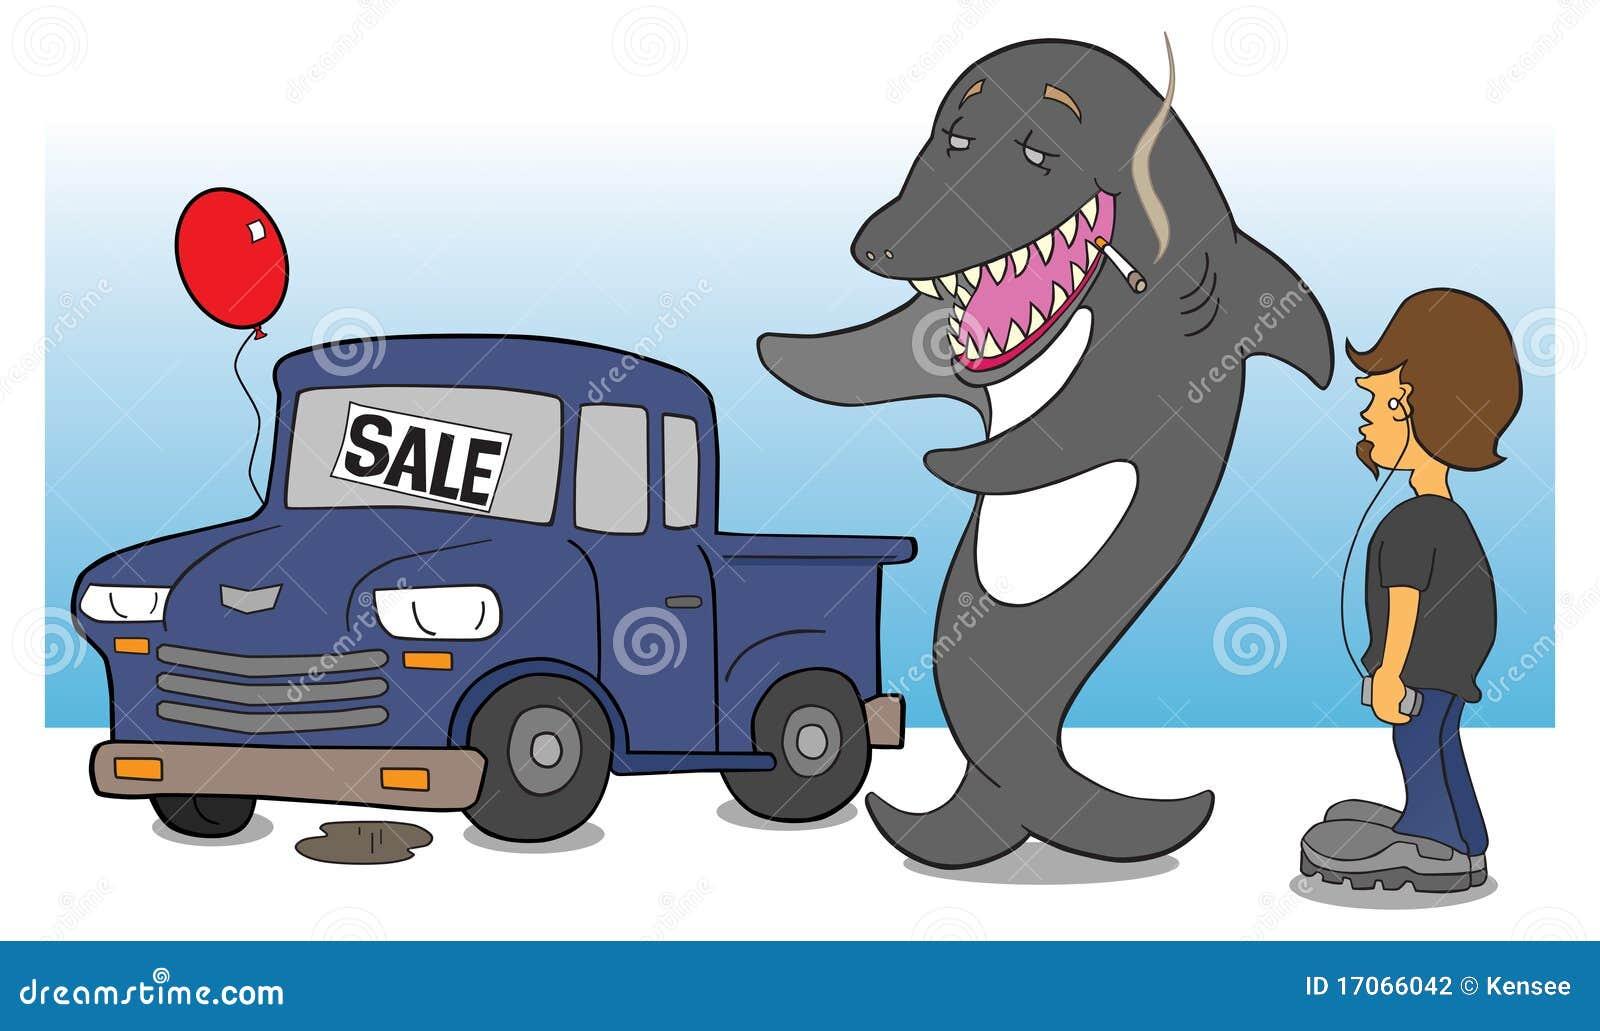 clipart car dealership - photo #26